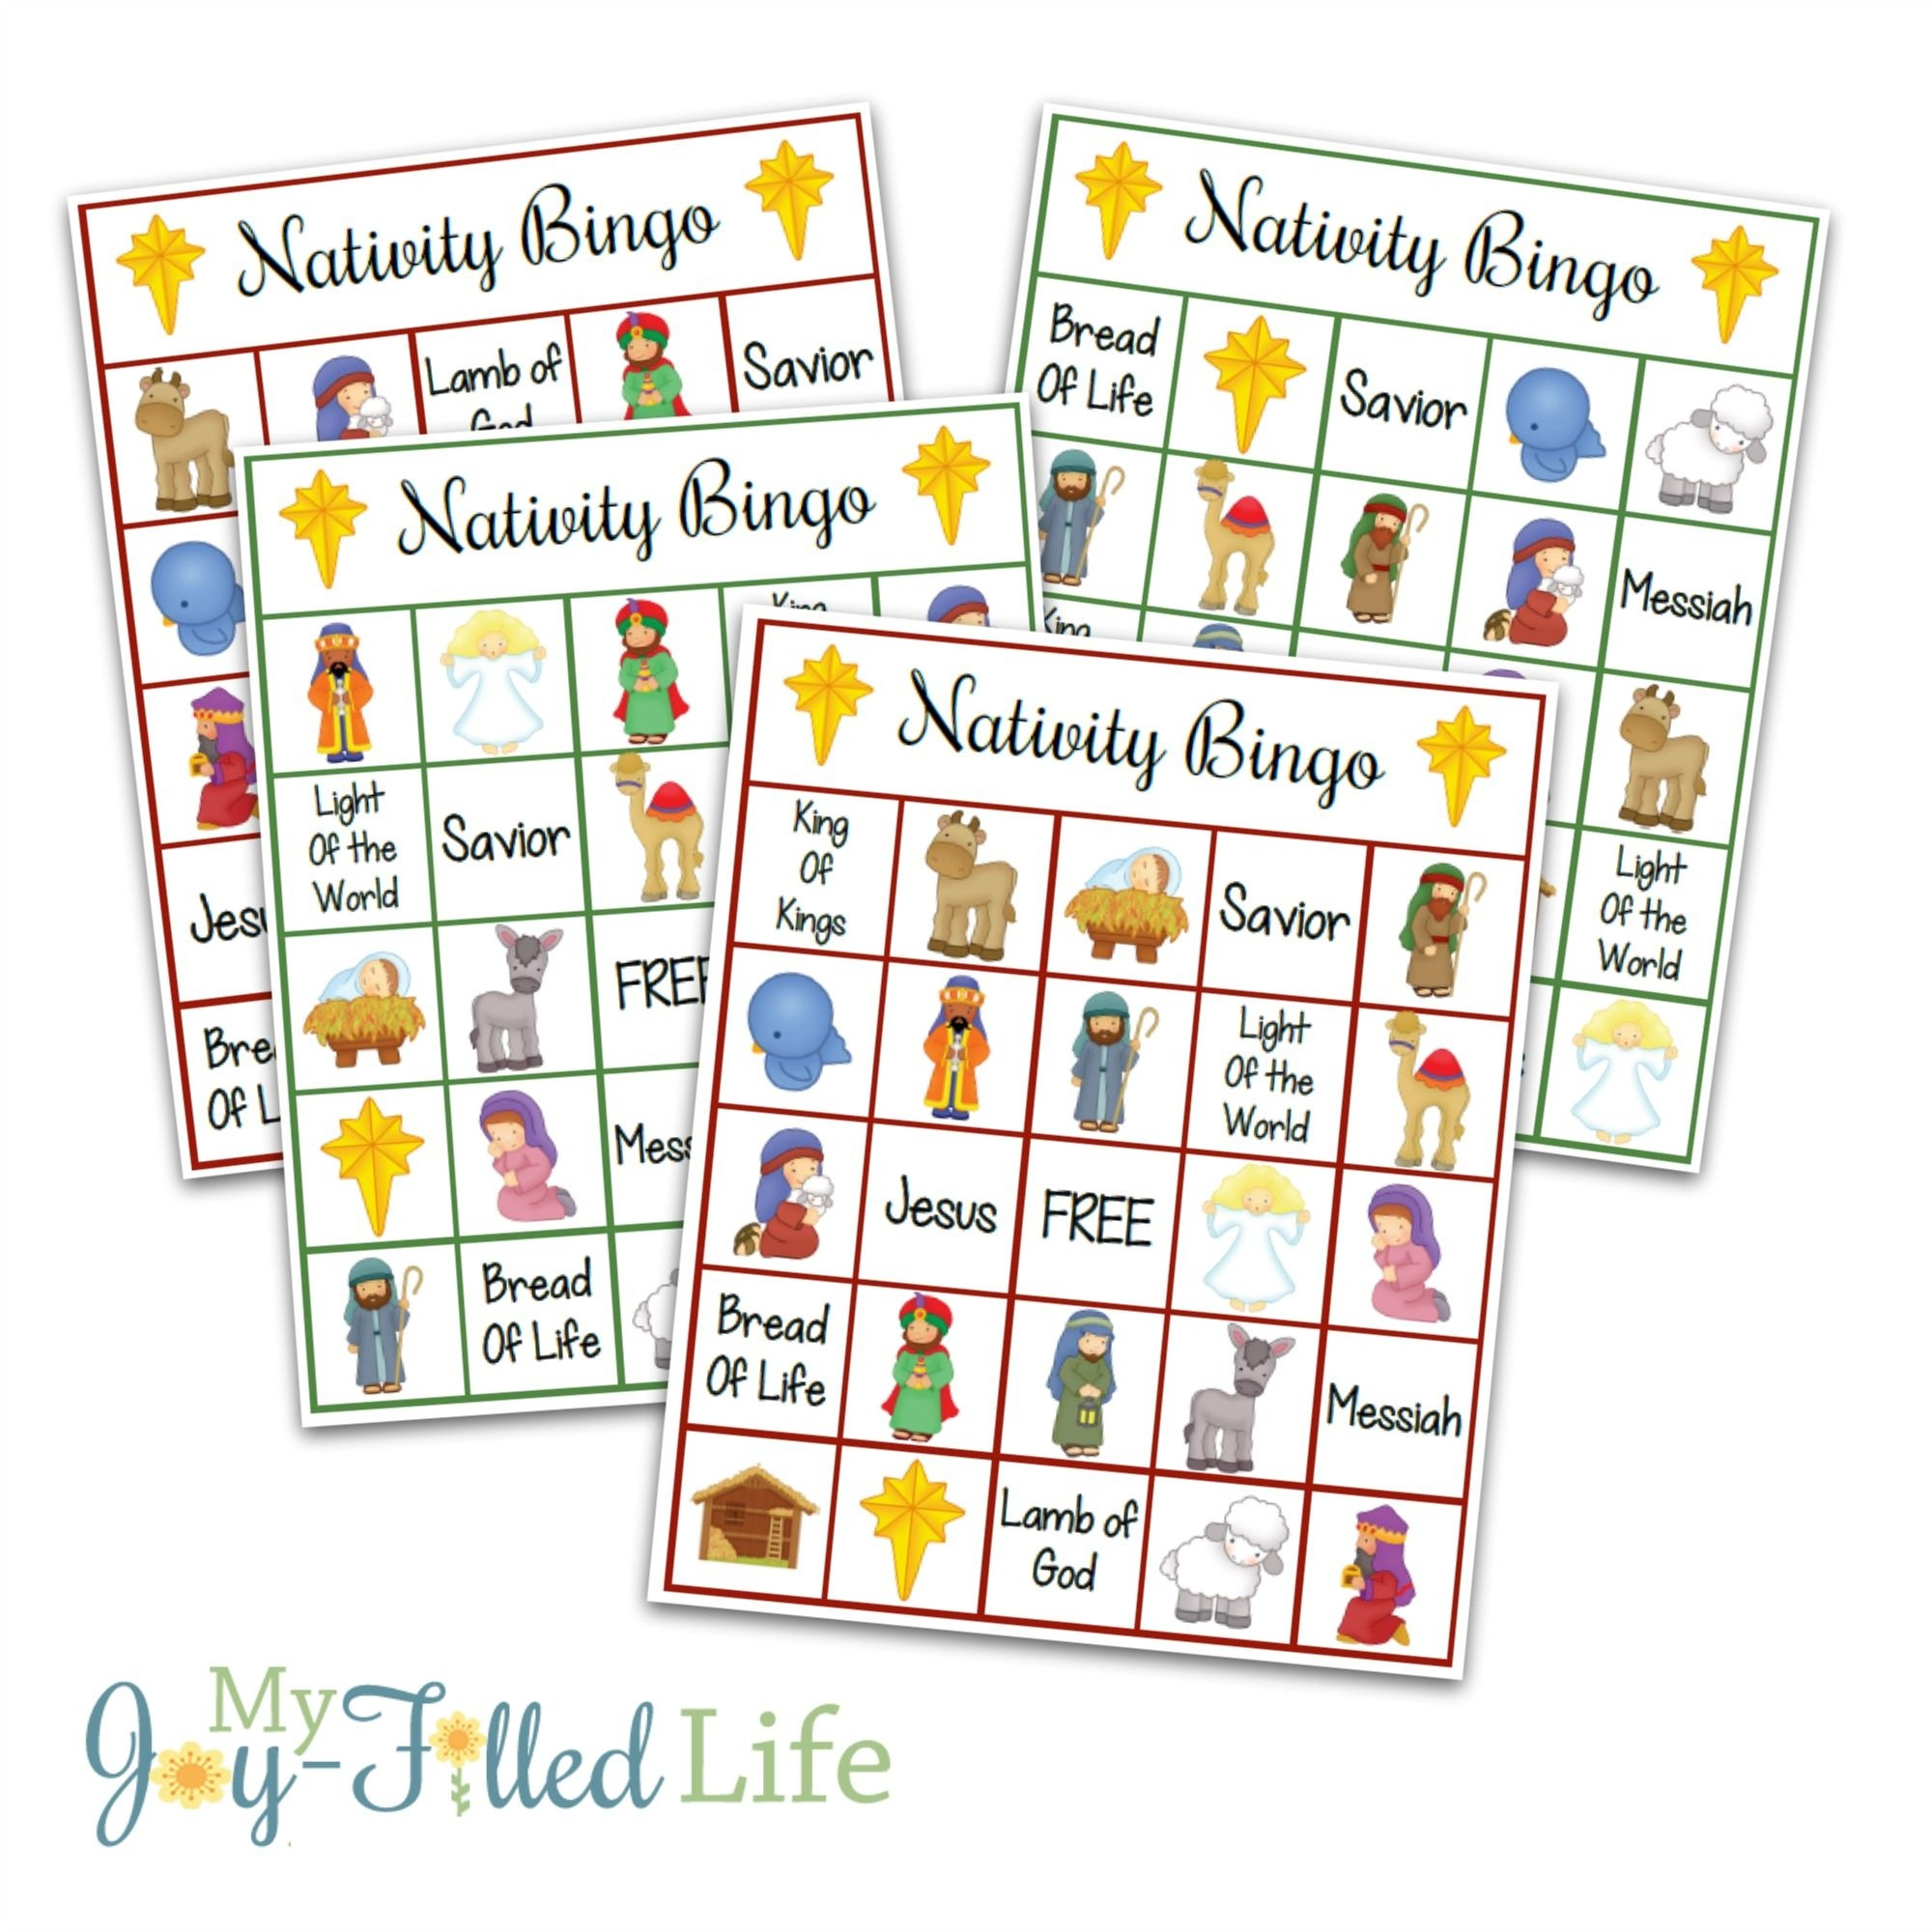 Printable Nativity Bingo Game   Games   Printable Christmas Games - Free Printable Bible Bingo For Preschoolers